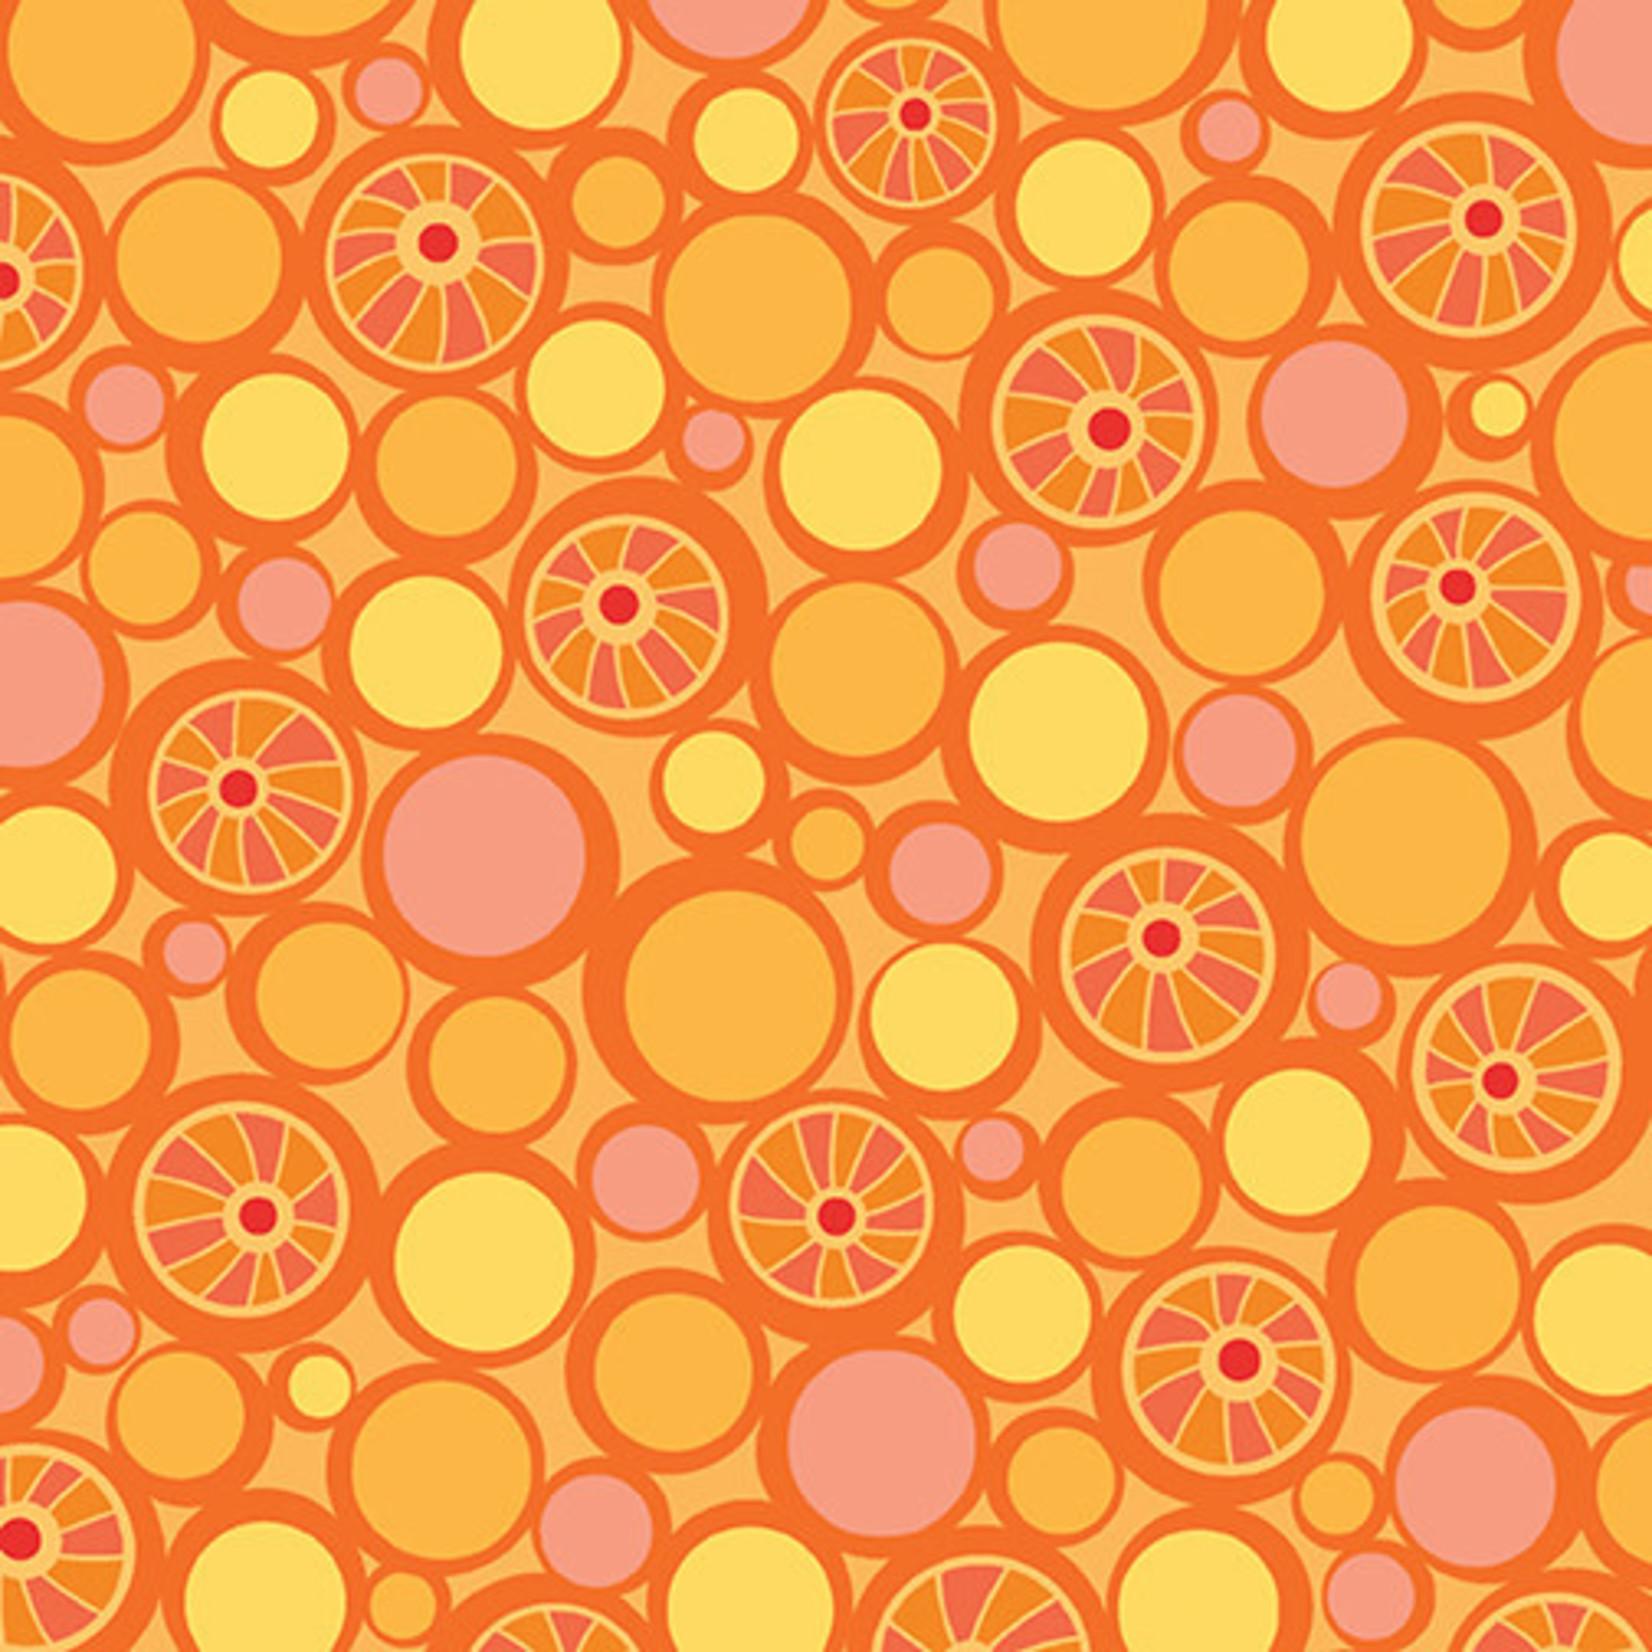 Contempo Studio Free Motion Fantasy - Pebbles - Hot Orange